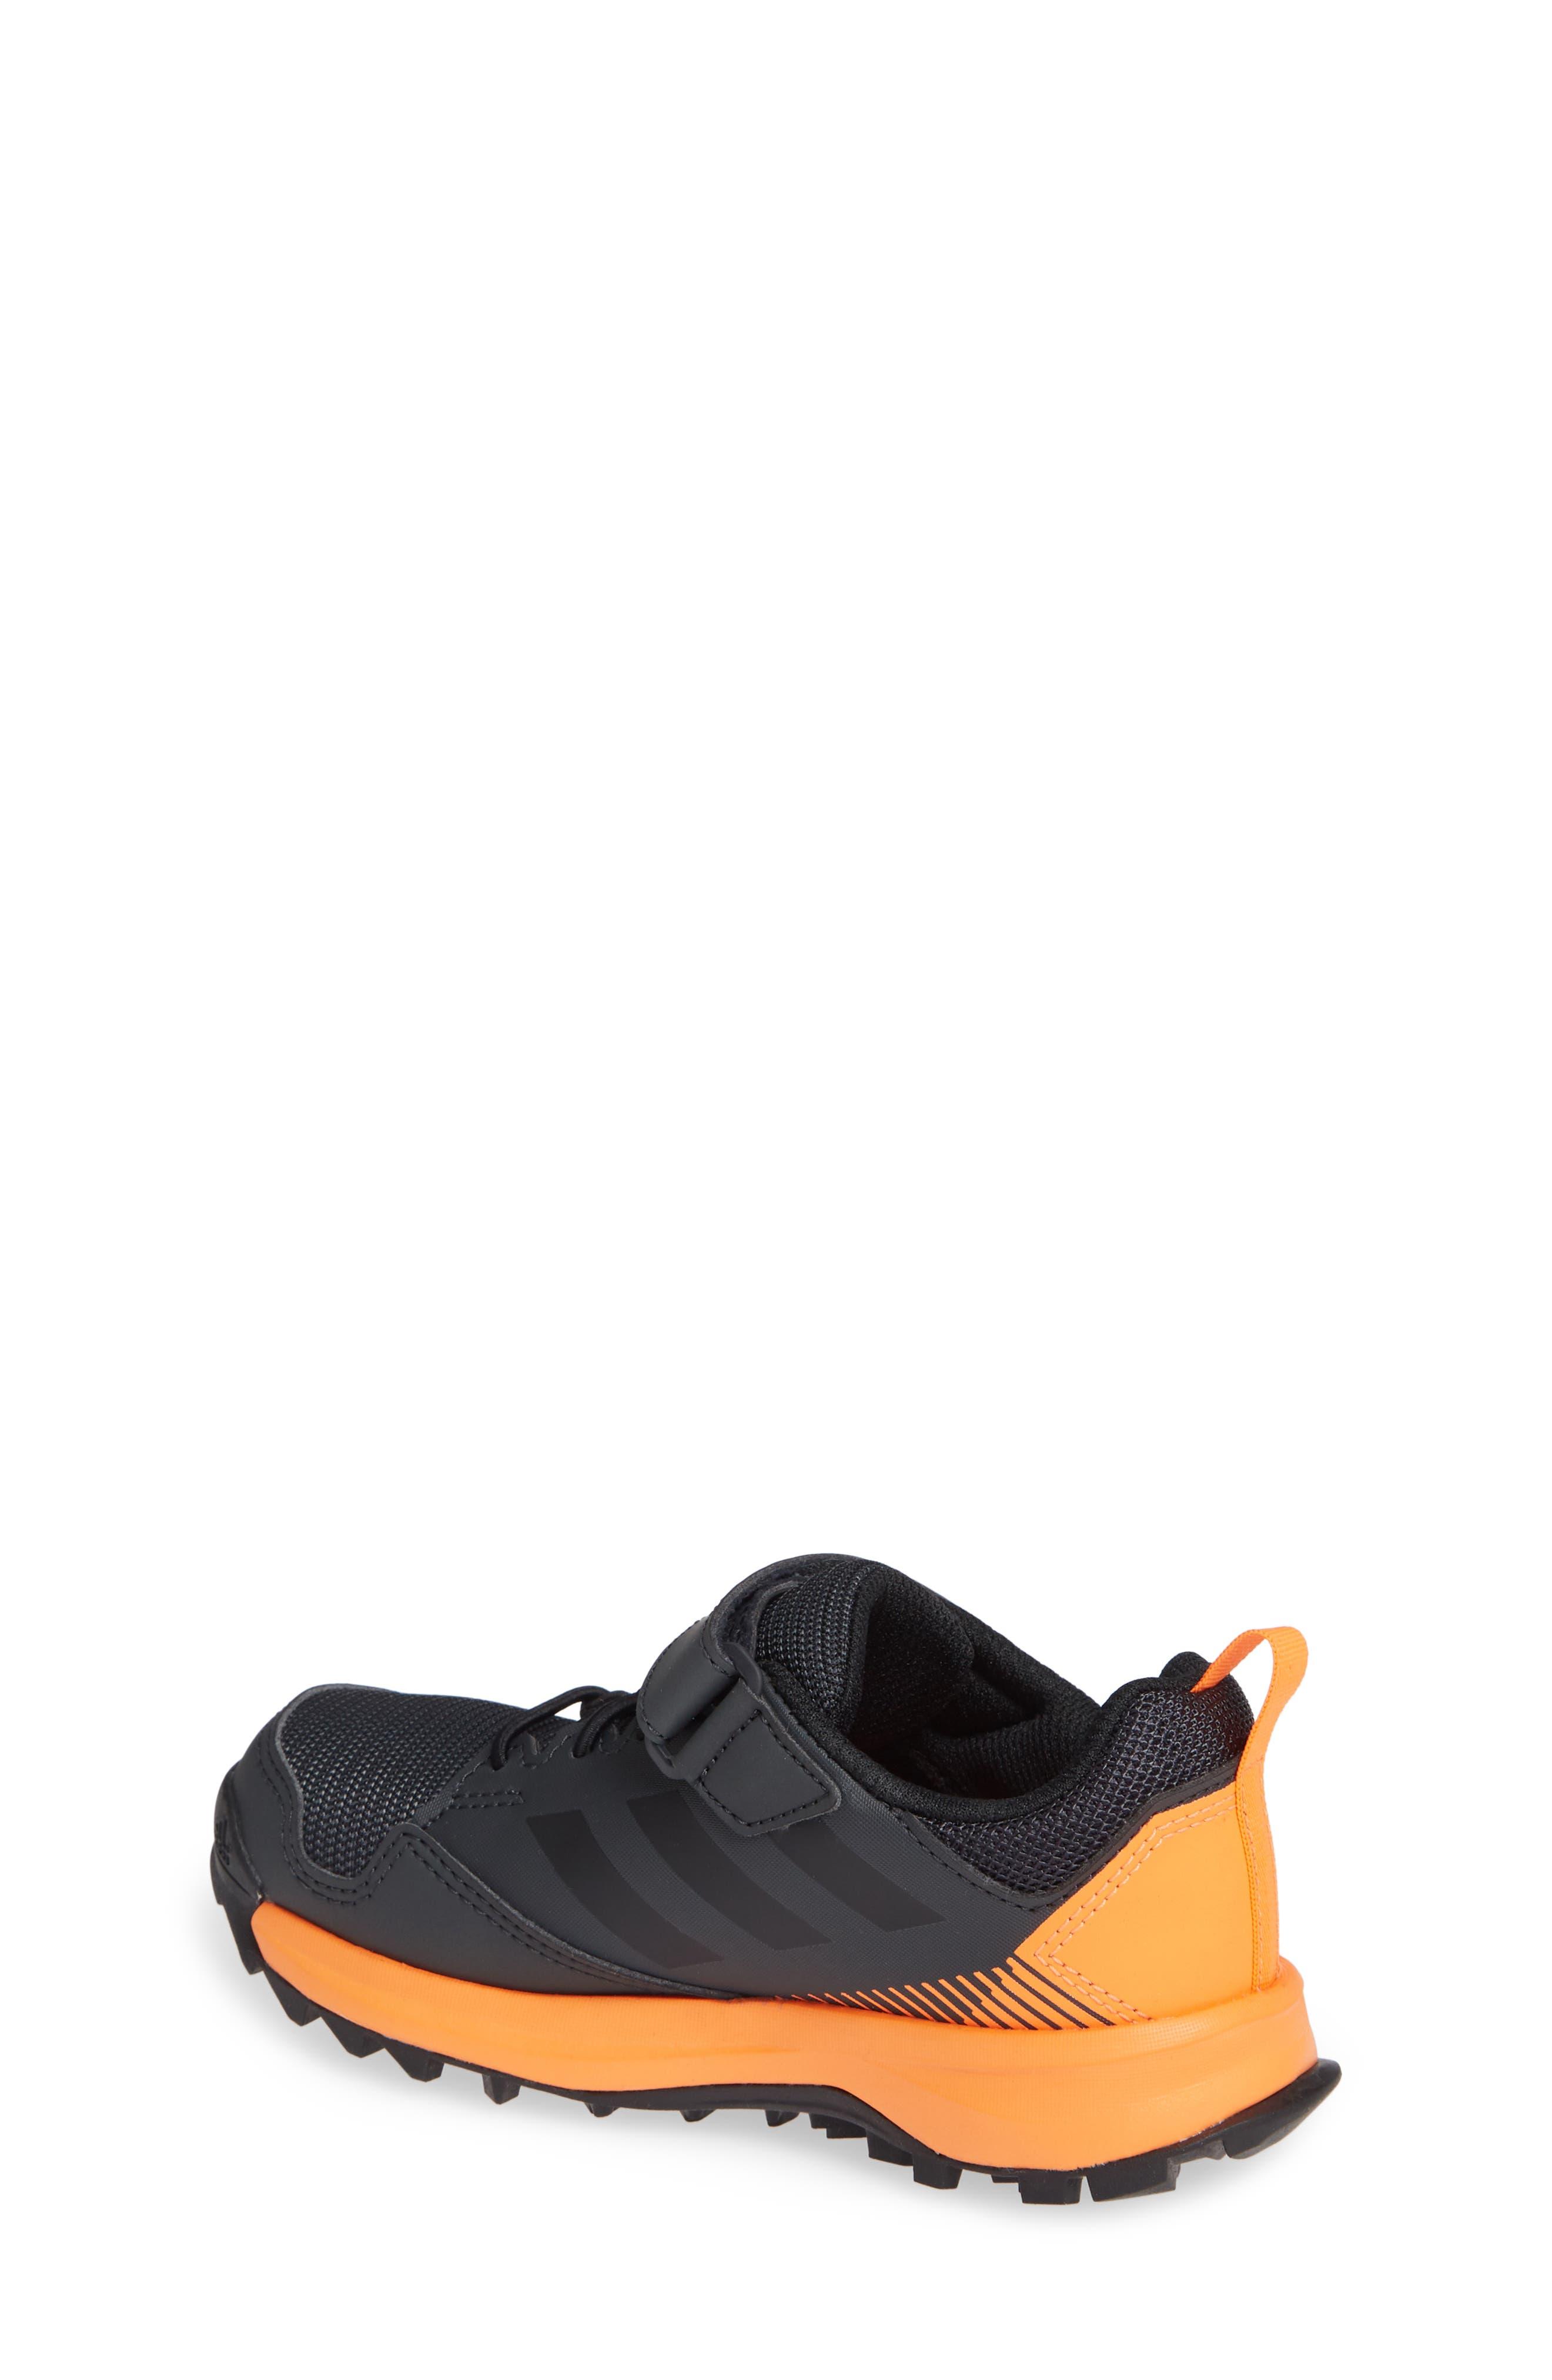 Tracerocker Sneaker,                             Alternate thumbnail 2, color,                             BLACK/ BLACK/ BLACK